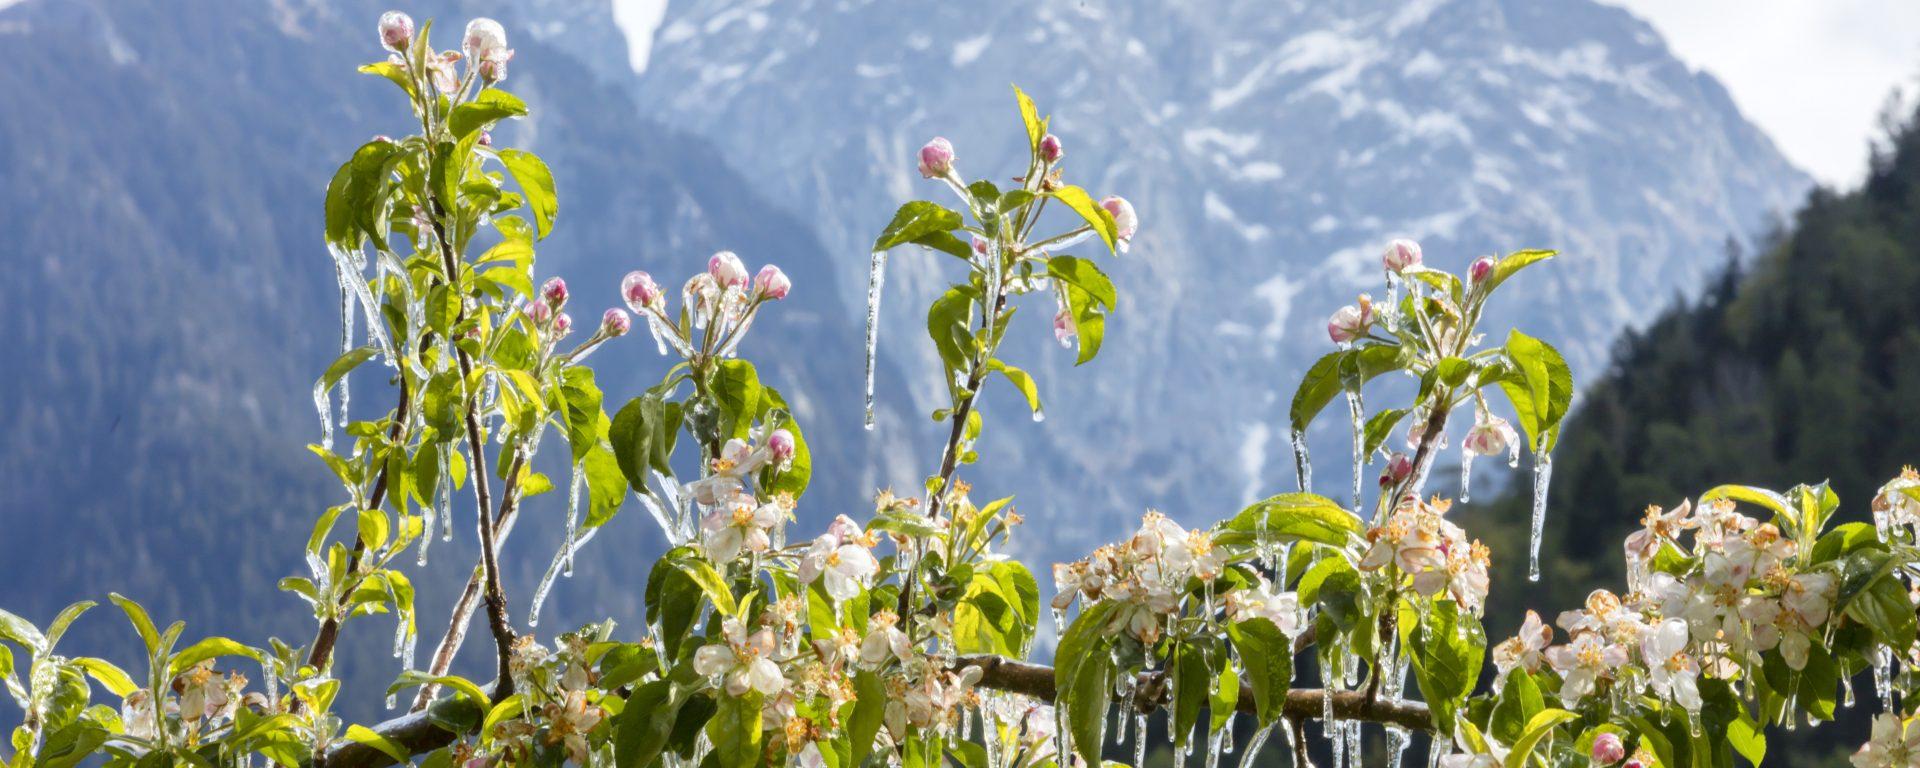 Suedtirol, Labers, oberhalb von Meran, Grumser-Hof, Frühling, Paar,Blüte, Apfelblüte, Apfelhof, Morgens, Frost, Frostberegnung,